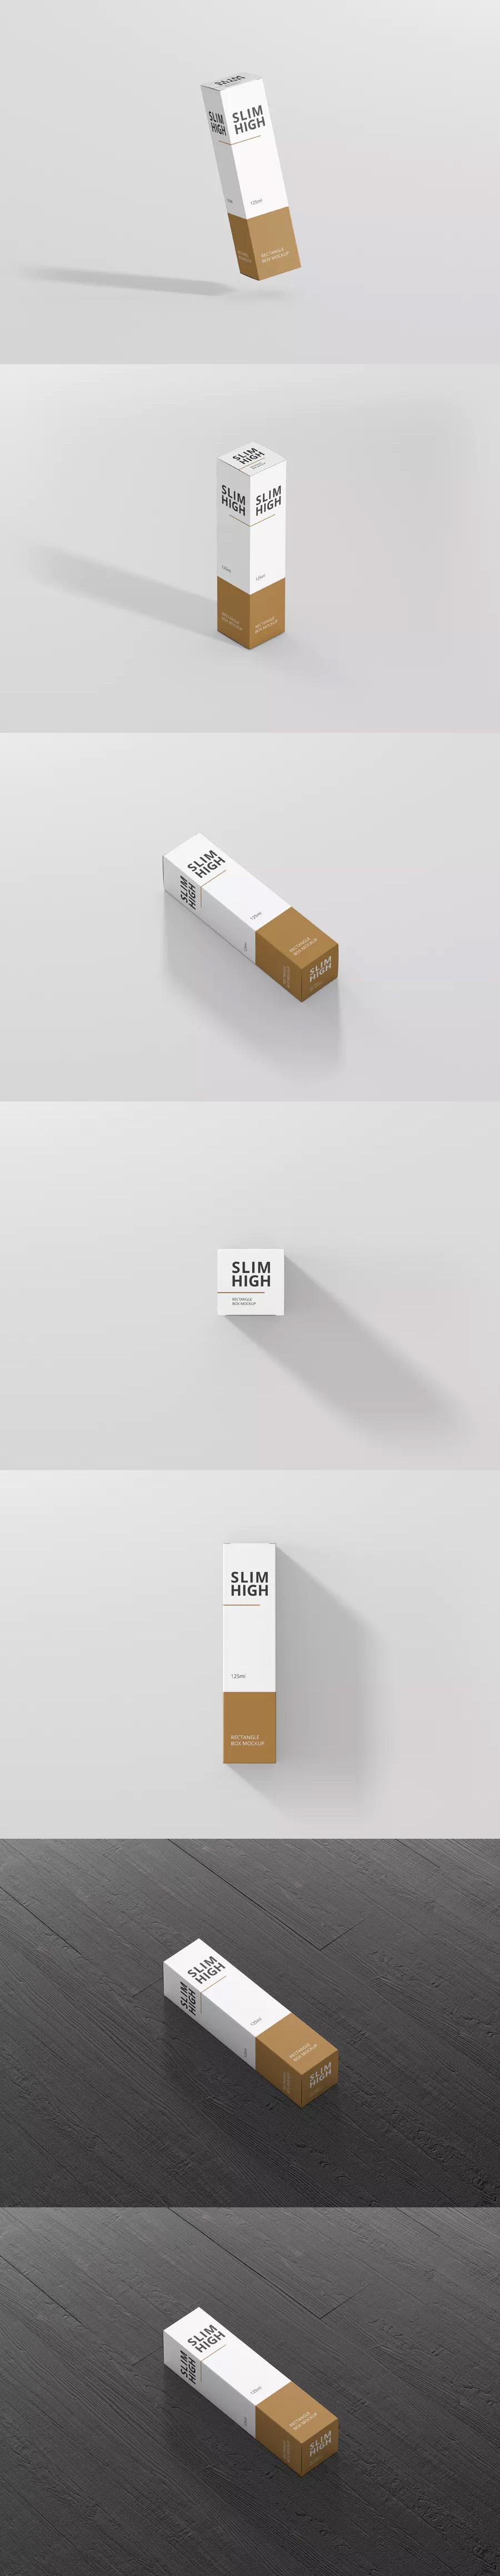 Box Mockup - Slim High Rectangle Template PSD